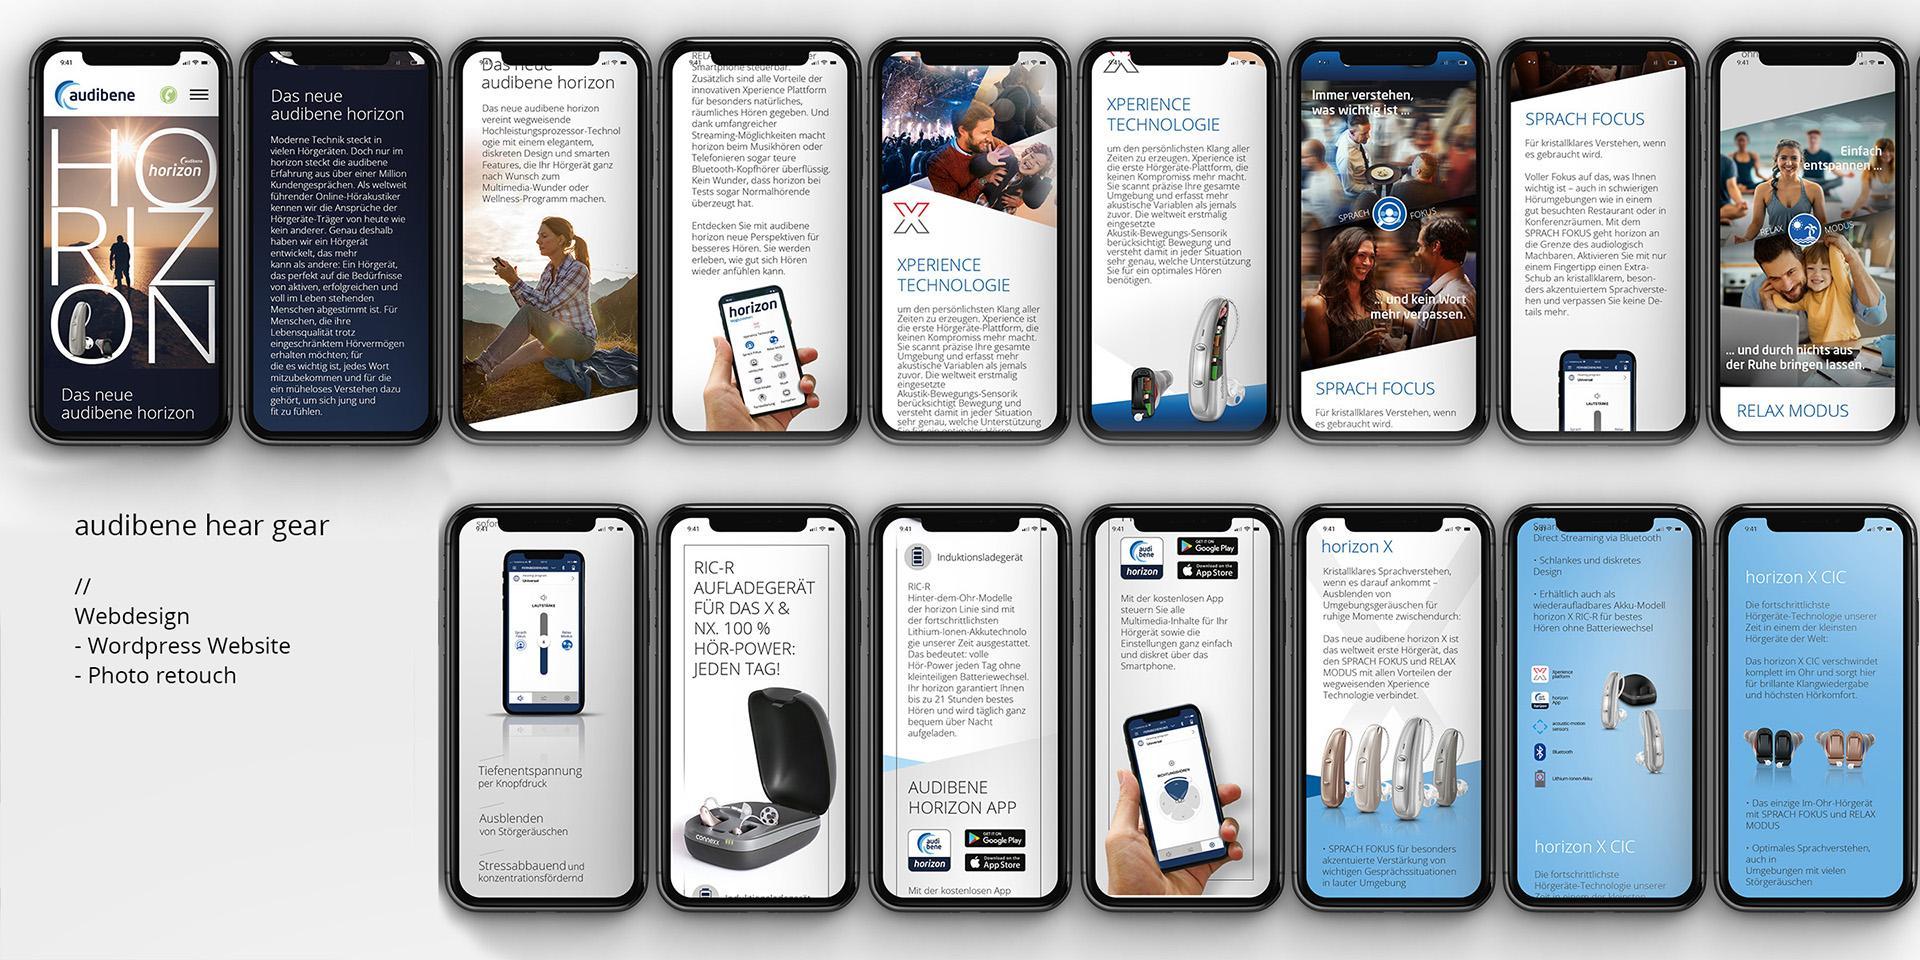 gfd ab website 2 mobile werbeagentur werbung grafik print Kreativ agentur muenchen full service 360 marketing